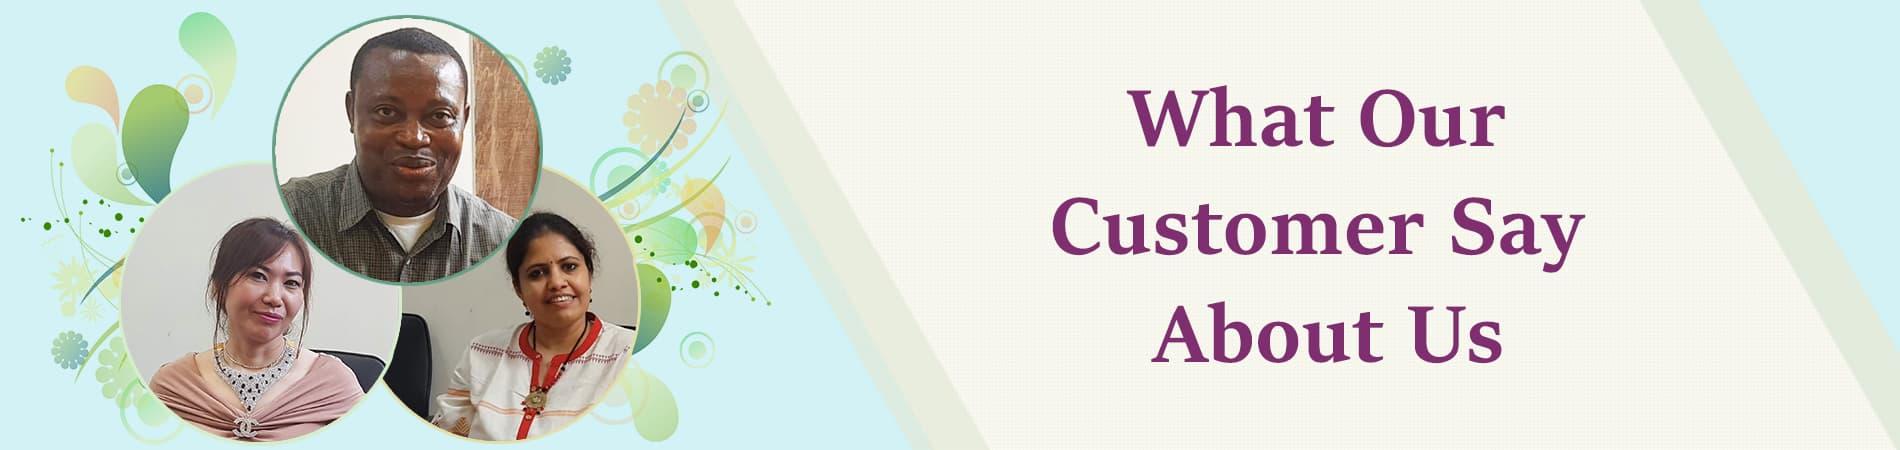 1580714557_Customer_Testimonials_What_Customer_Say_About_Us.jpg